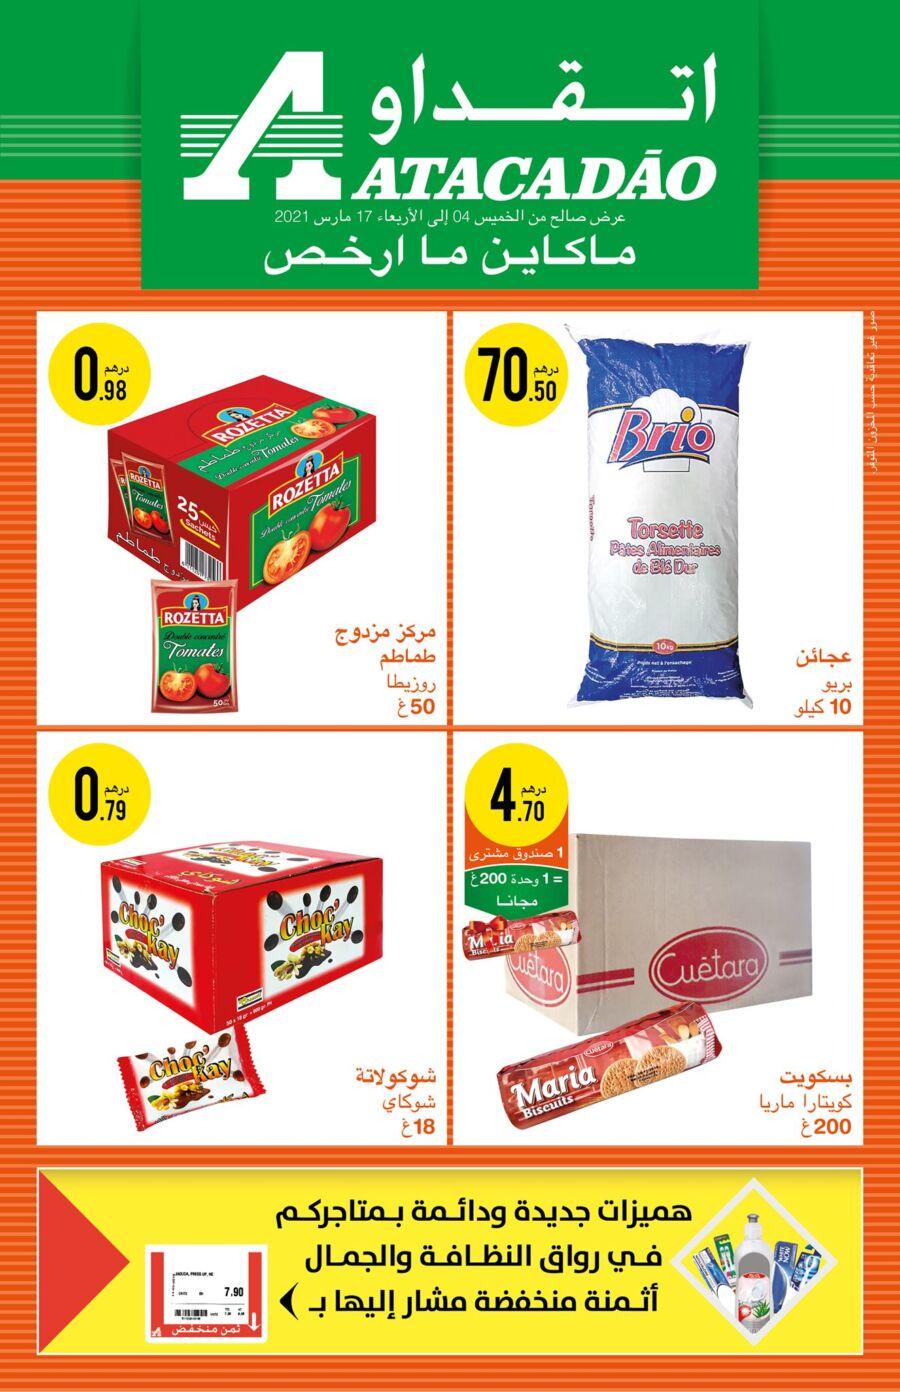 Catalogue Atacadao Maroc ما كاين ارخص valable du 4 au 17 Mars 2021